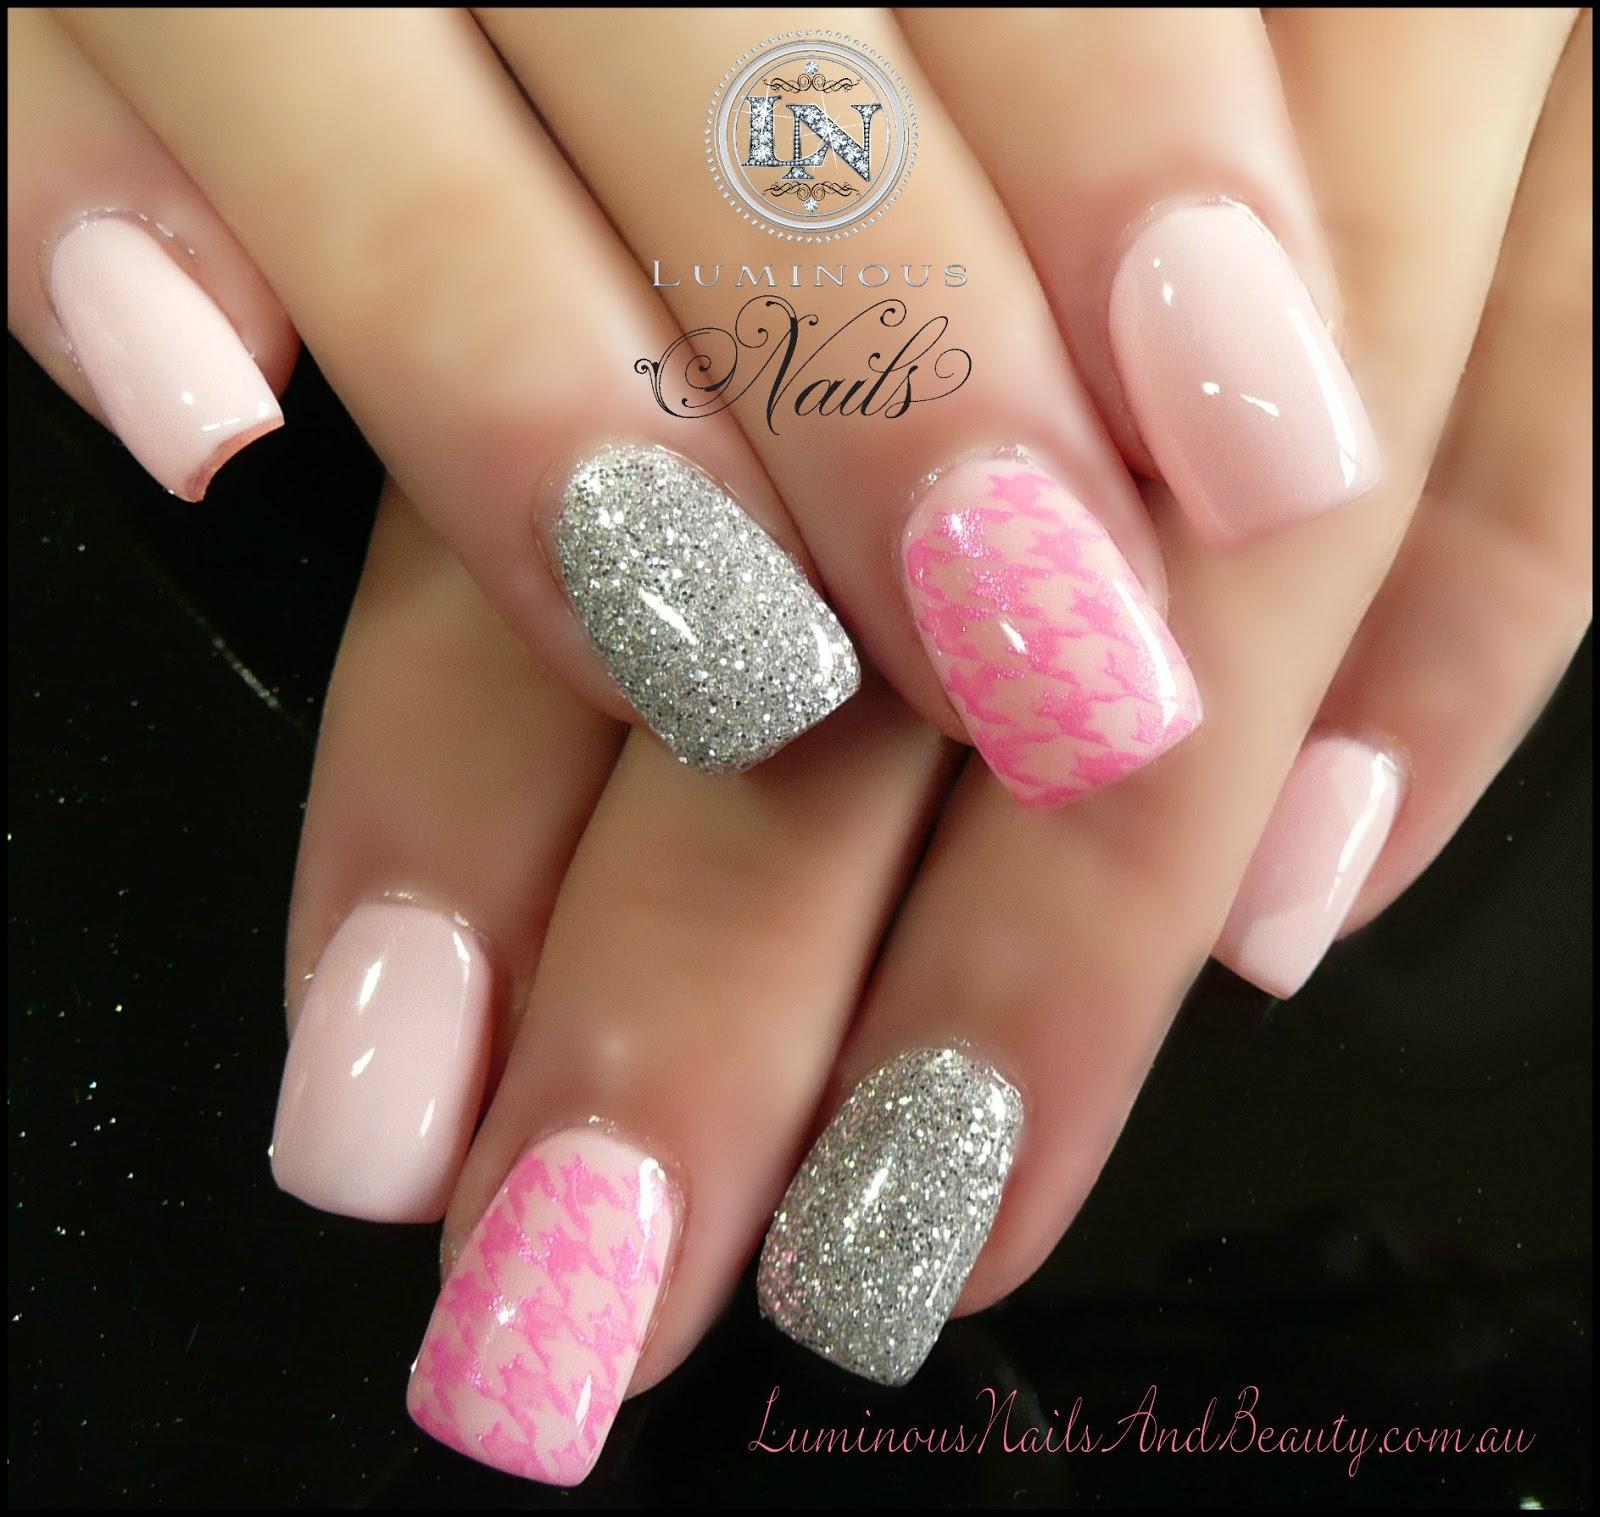 Gel acrylic nails - Expression Nails